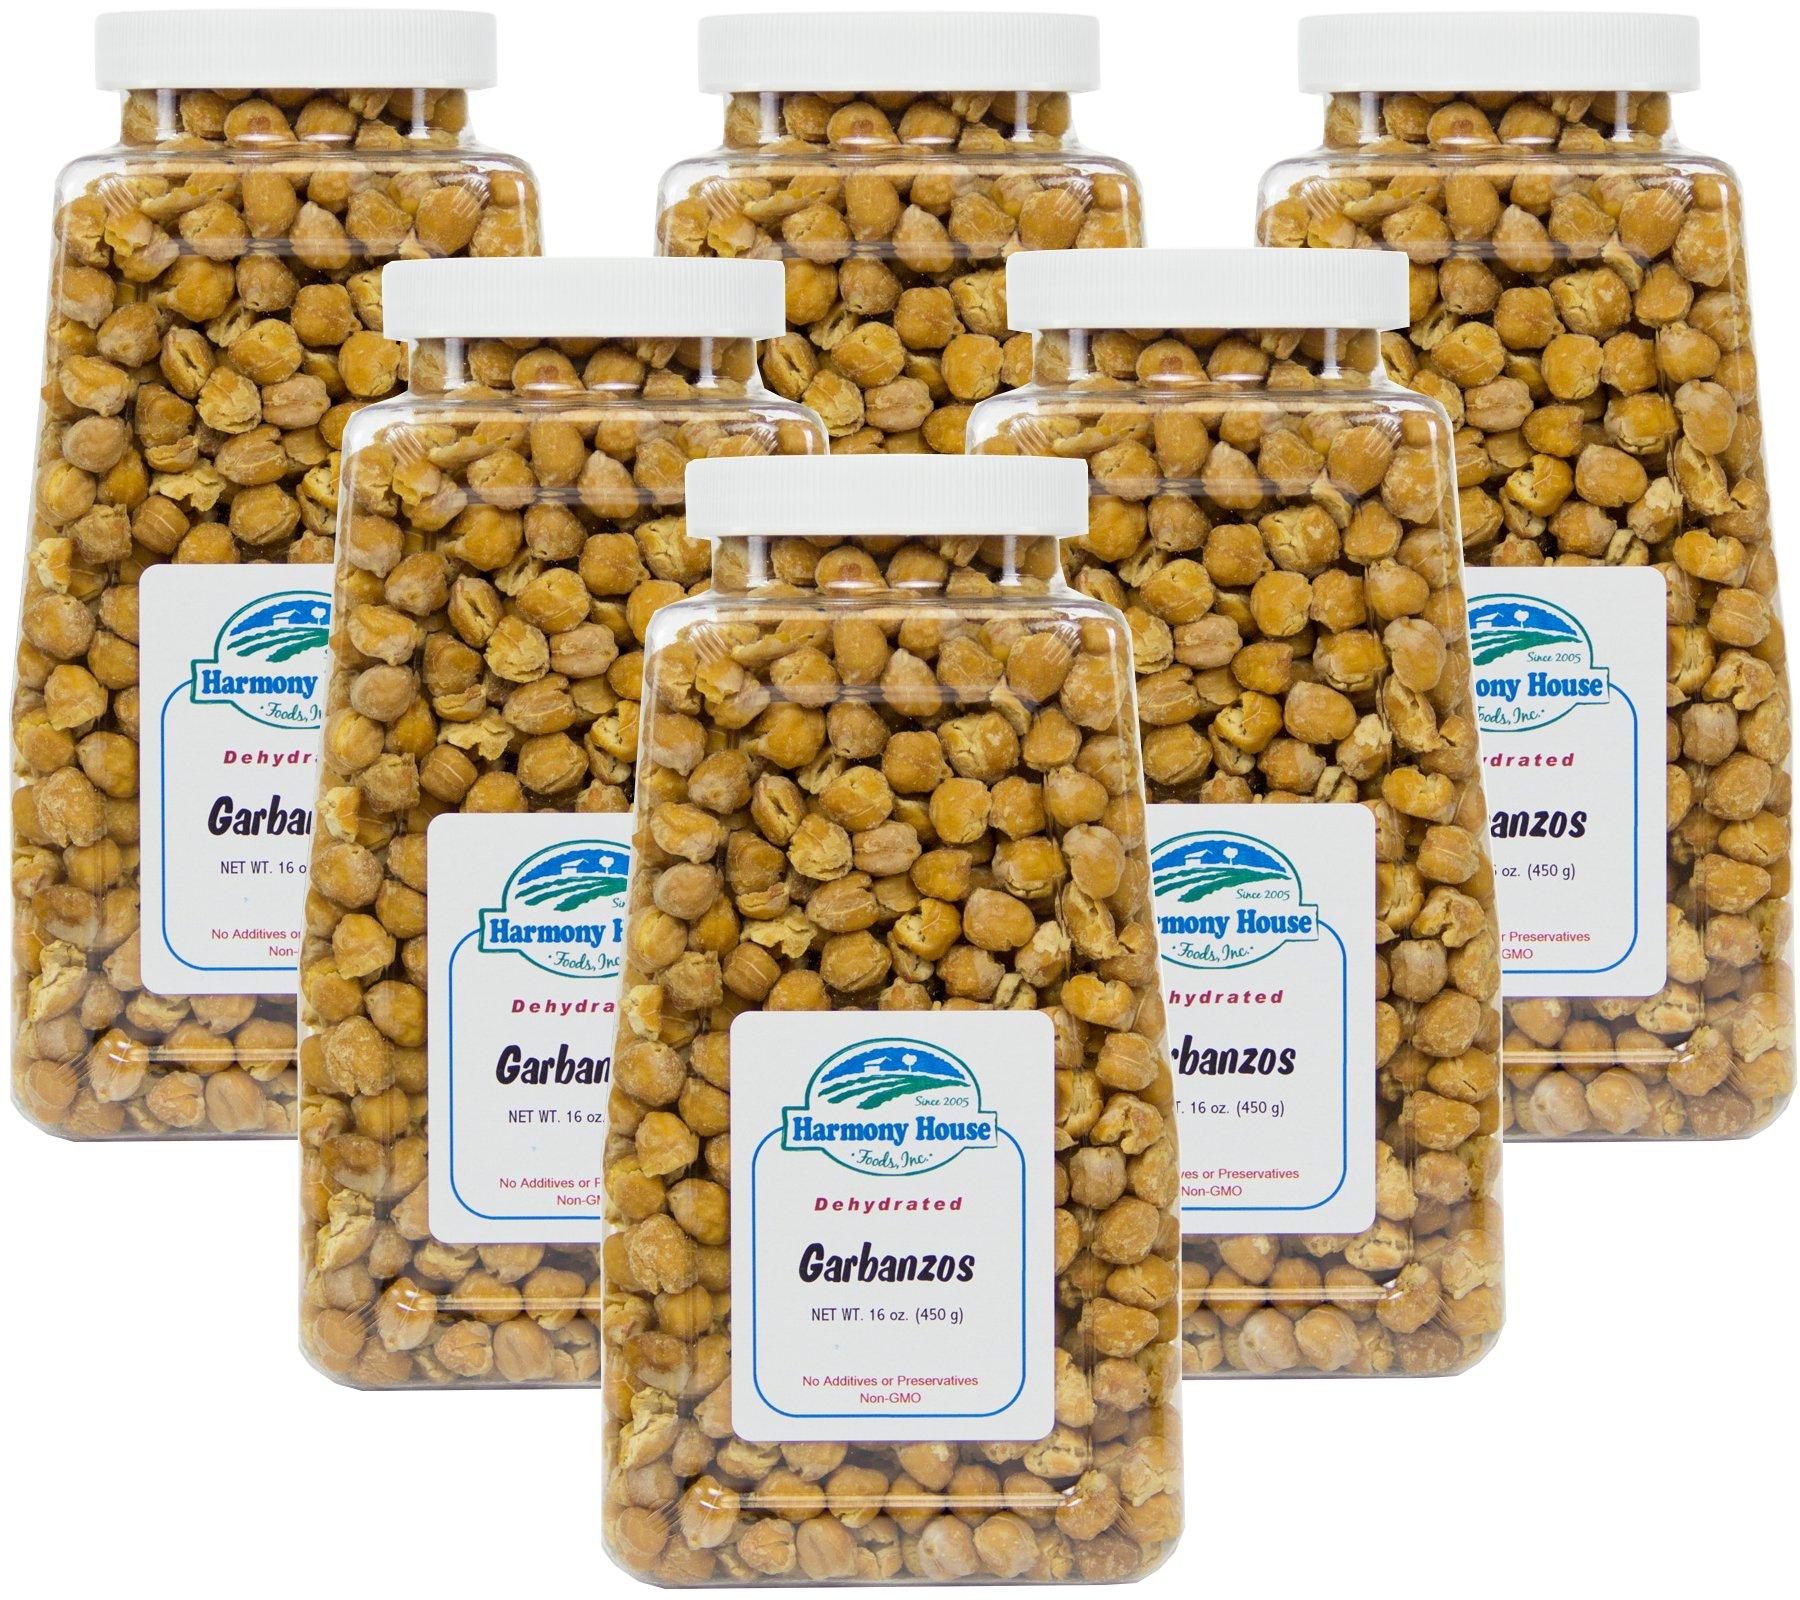 Harmony House Foods Dehydrated Garbanzo Beans (16 Oz Quart Size Jar) - Set of 6